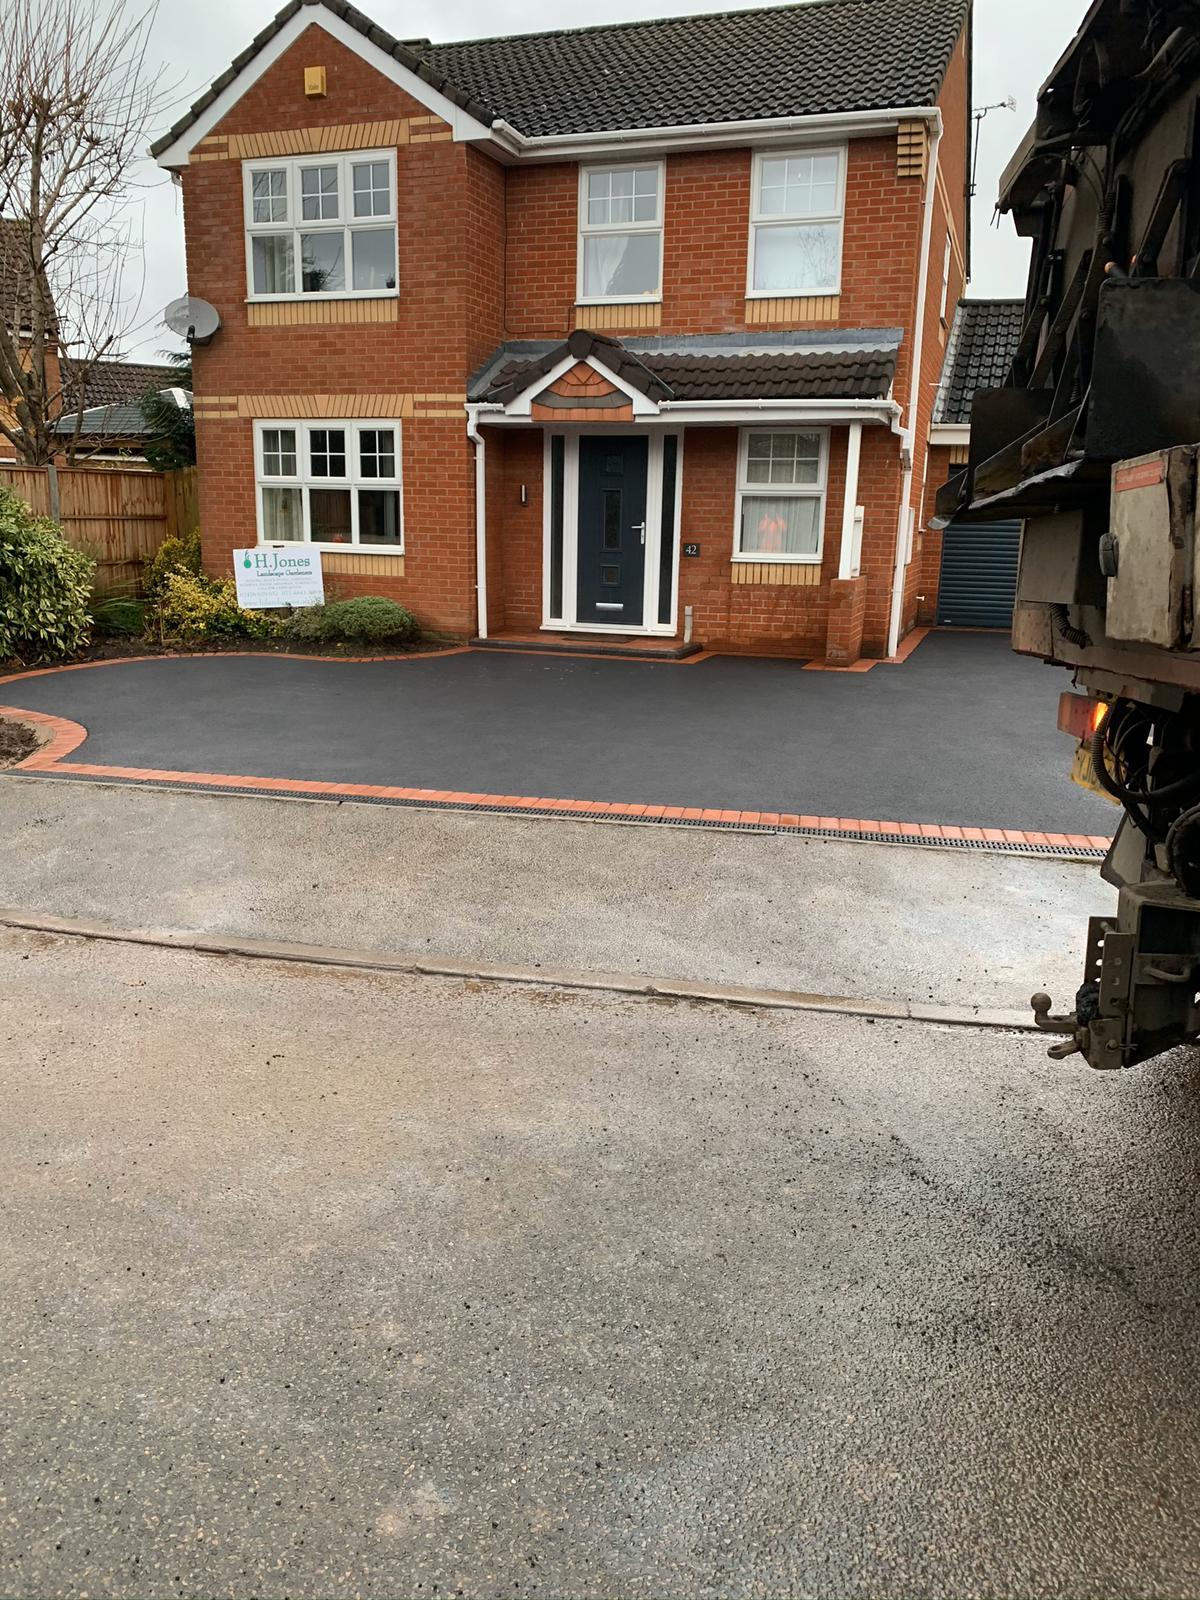 Finished tarmac driveway project in nuneaton